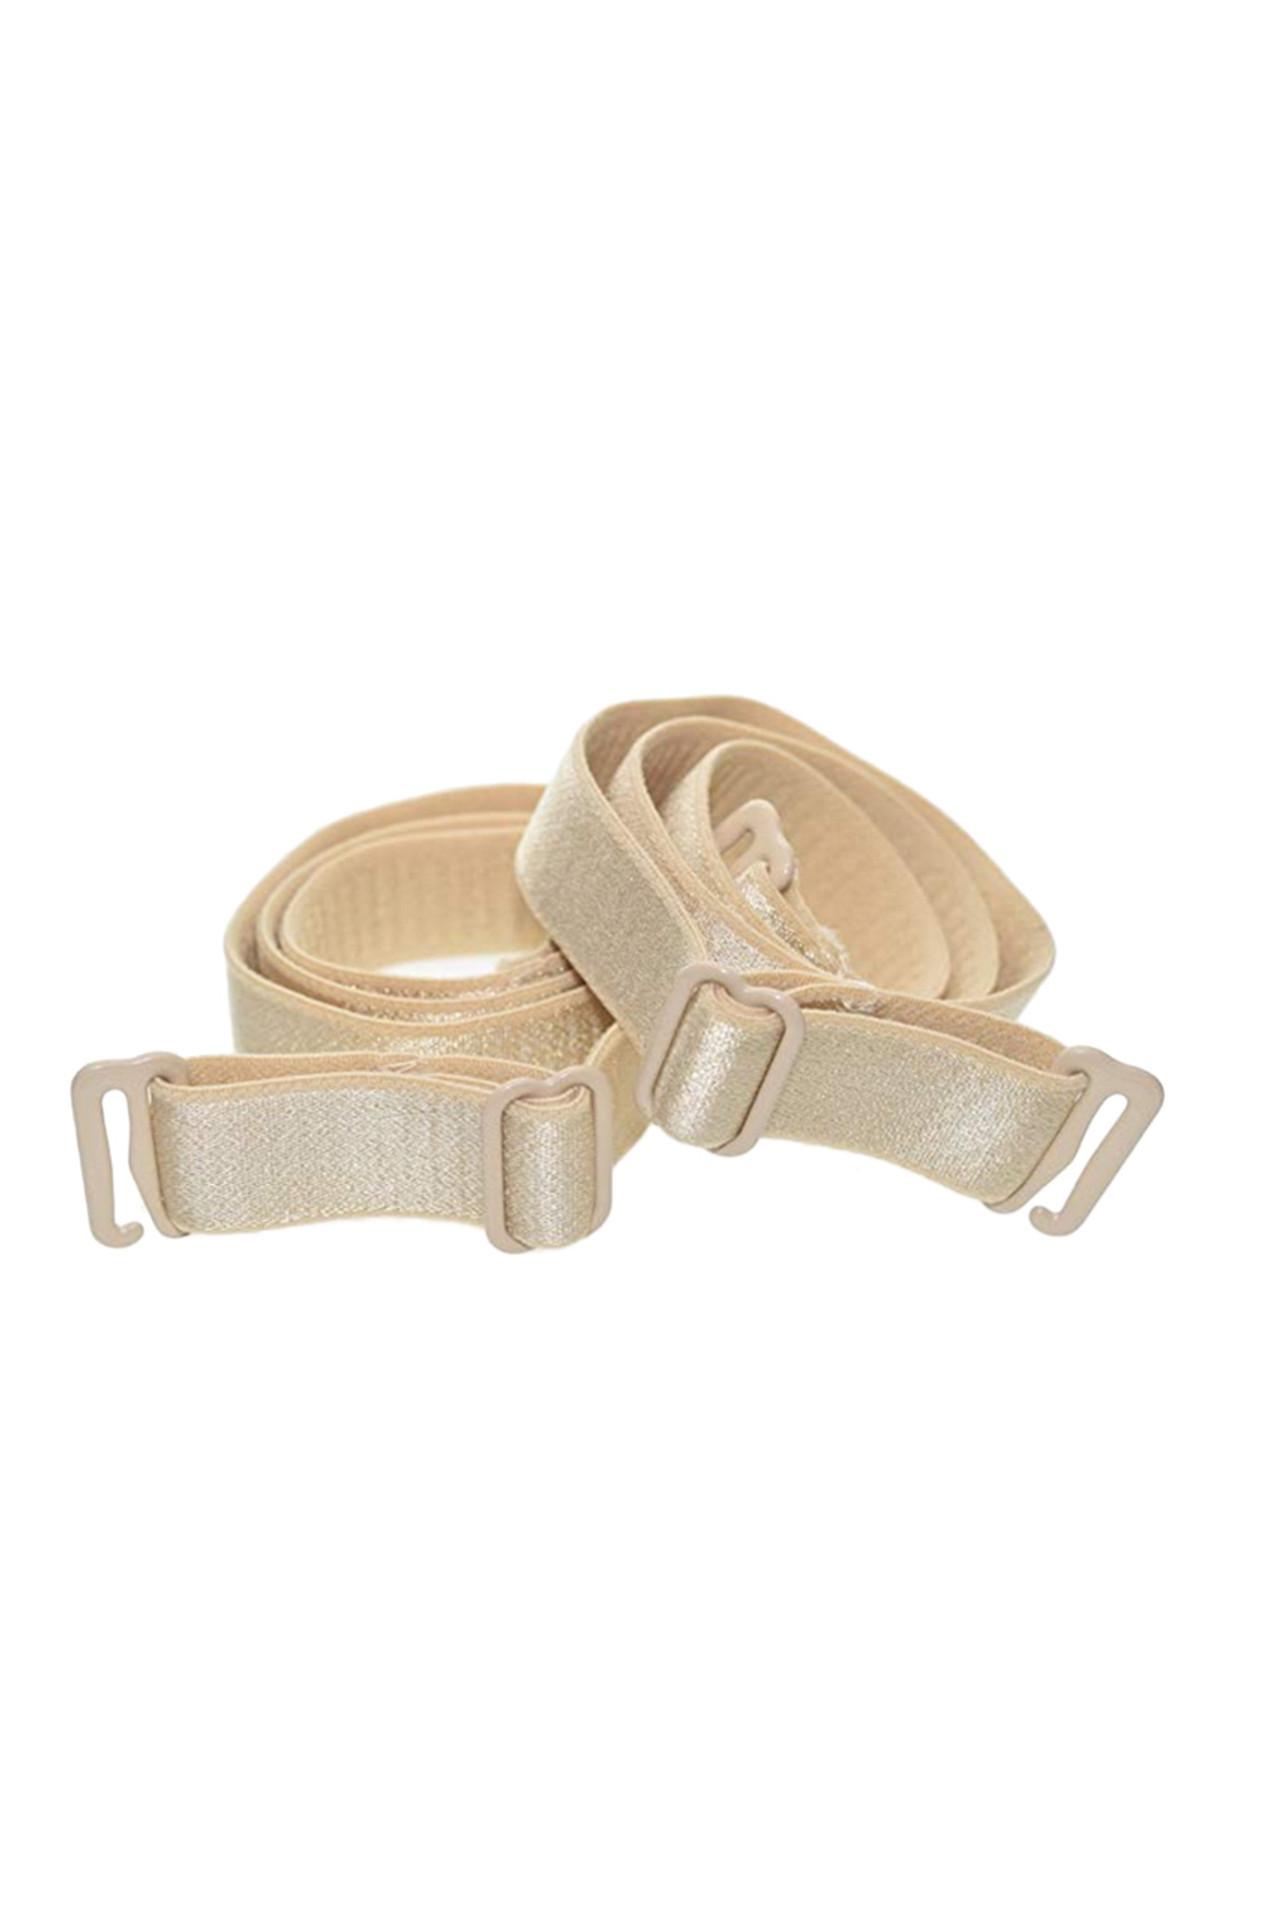 Adjustable Bra Straps